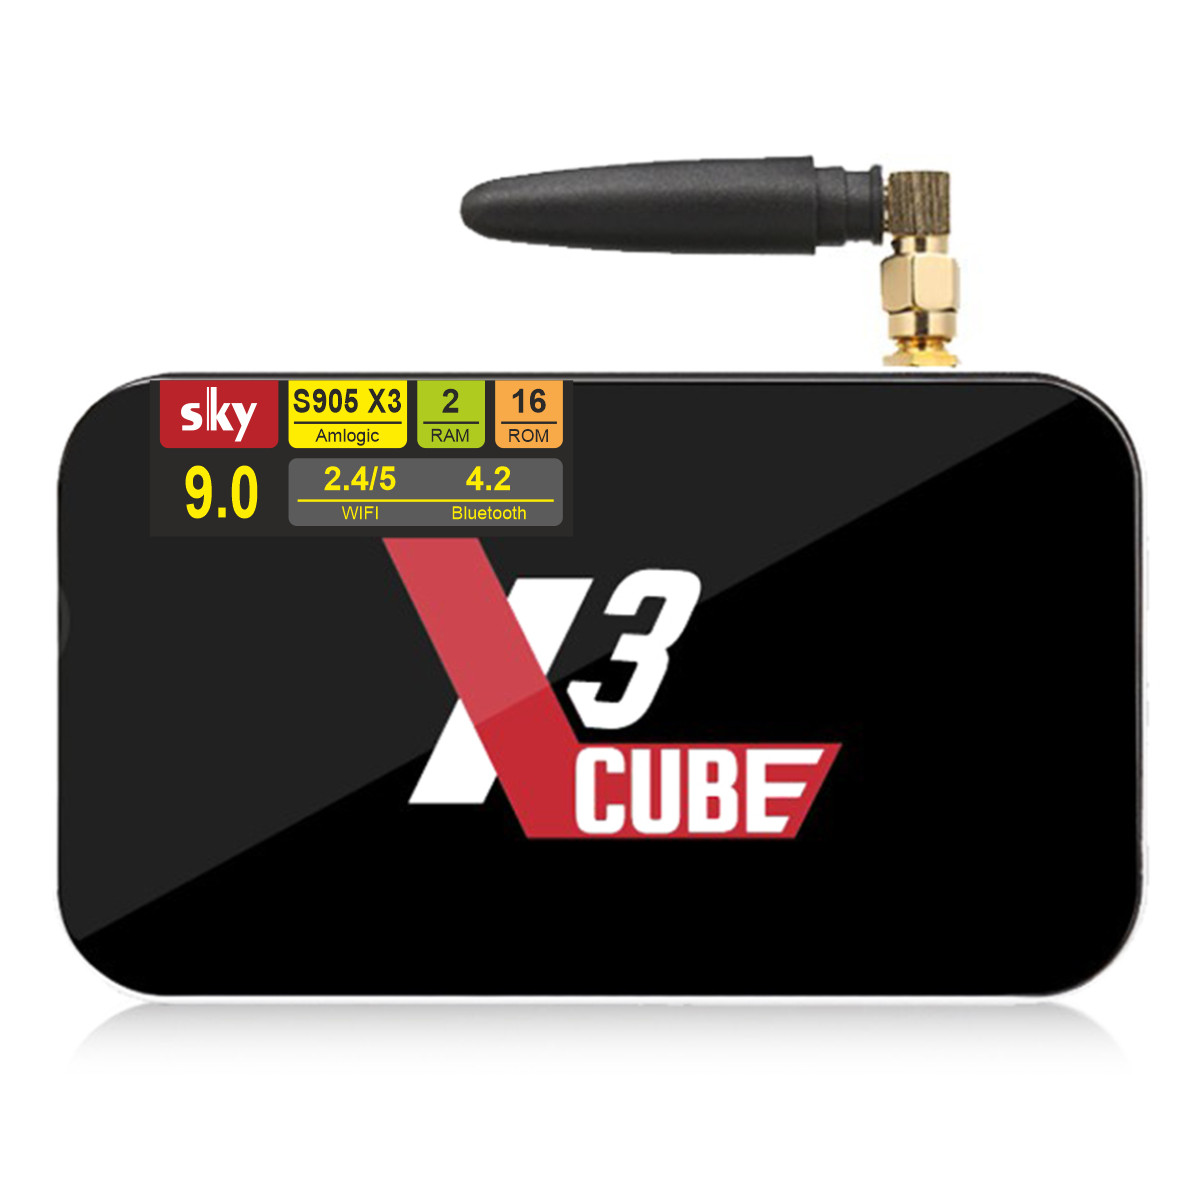 Android Smart TV приставка SKY (UGOOS X3 cube) 2/16 GB